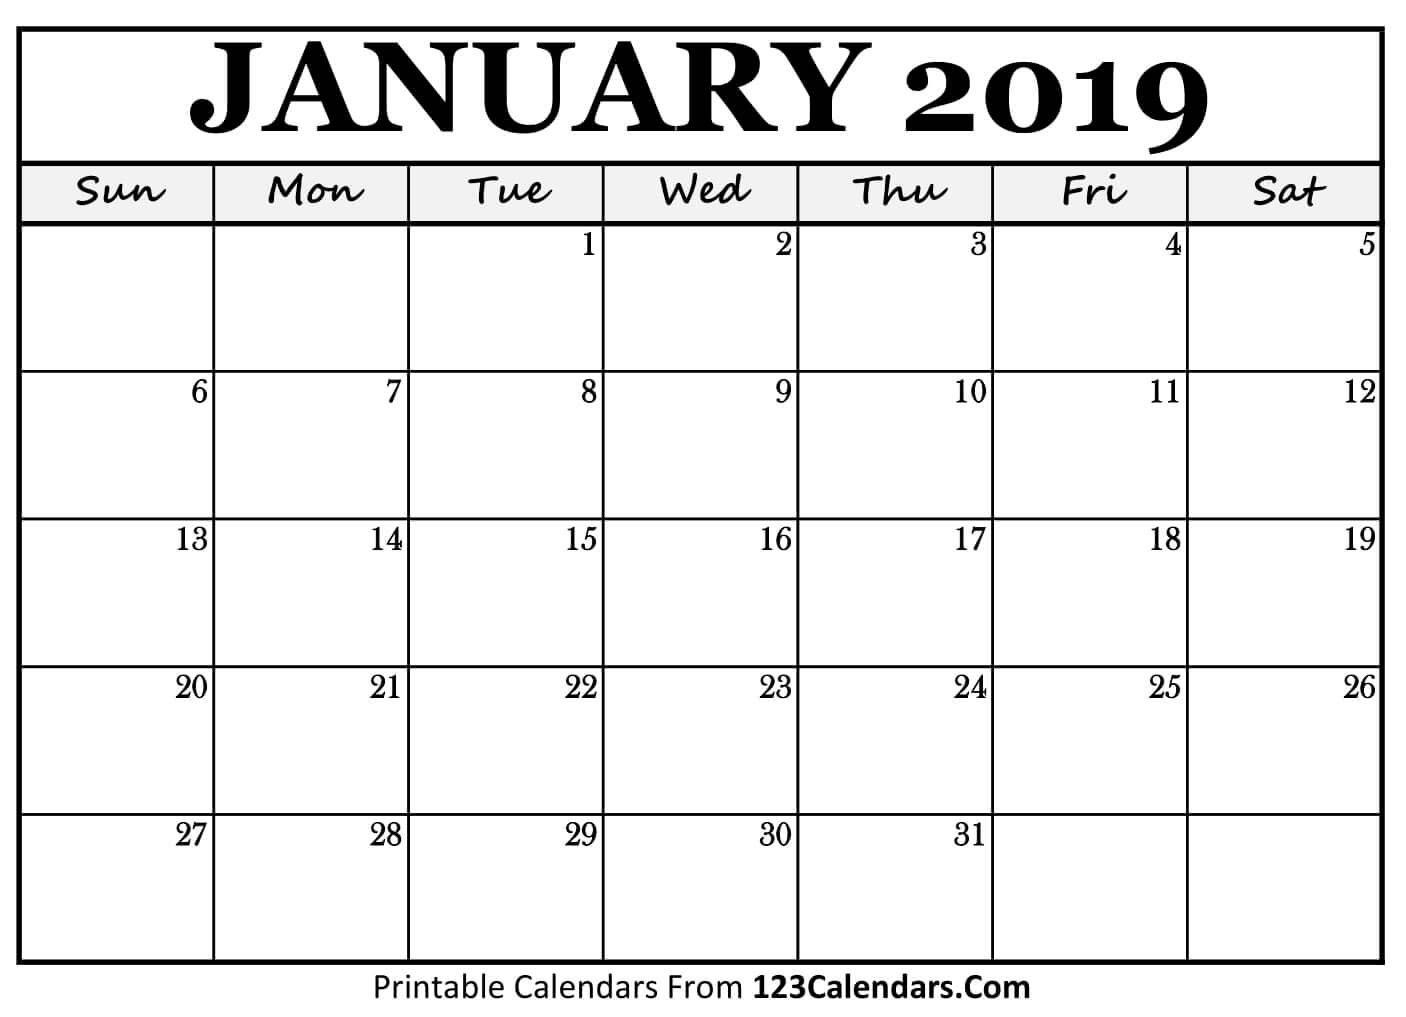 2019 Printable Calendar - 123Calendars 2019 Calendars